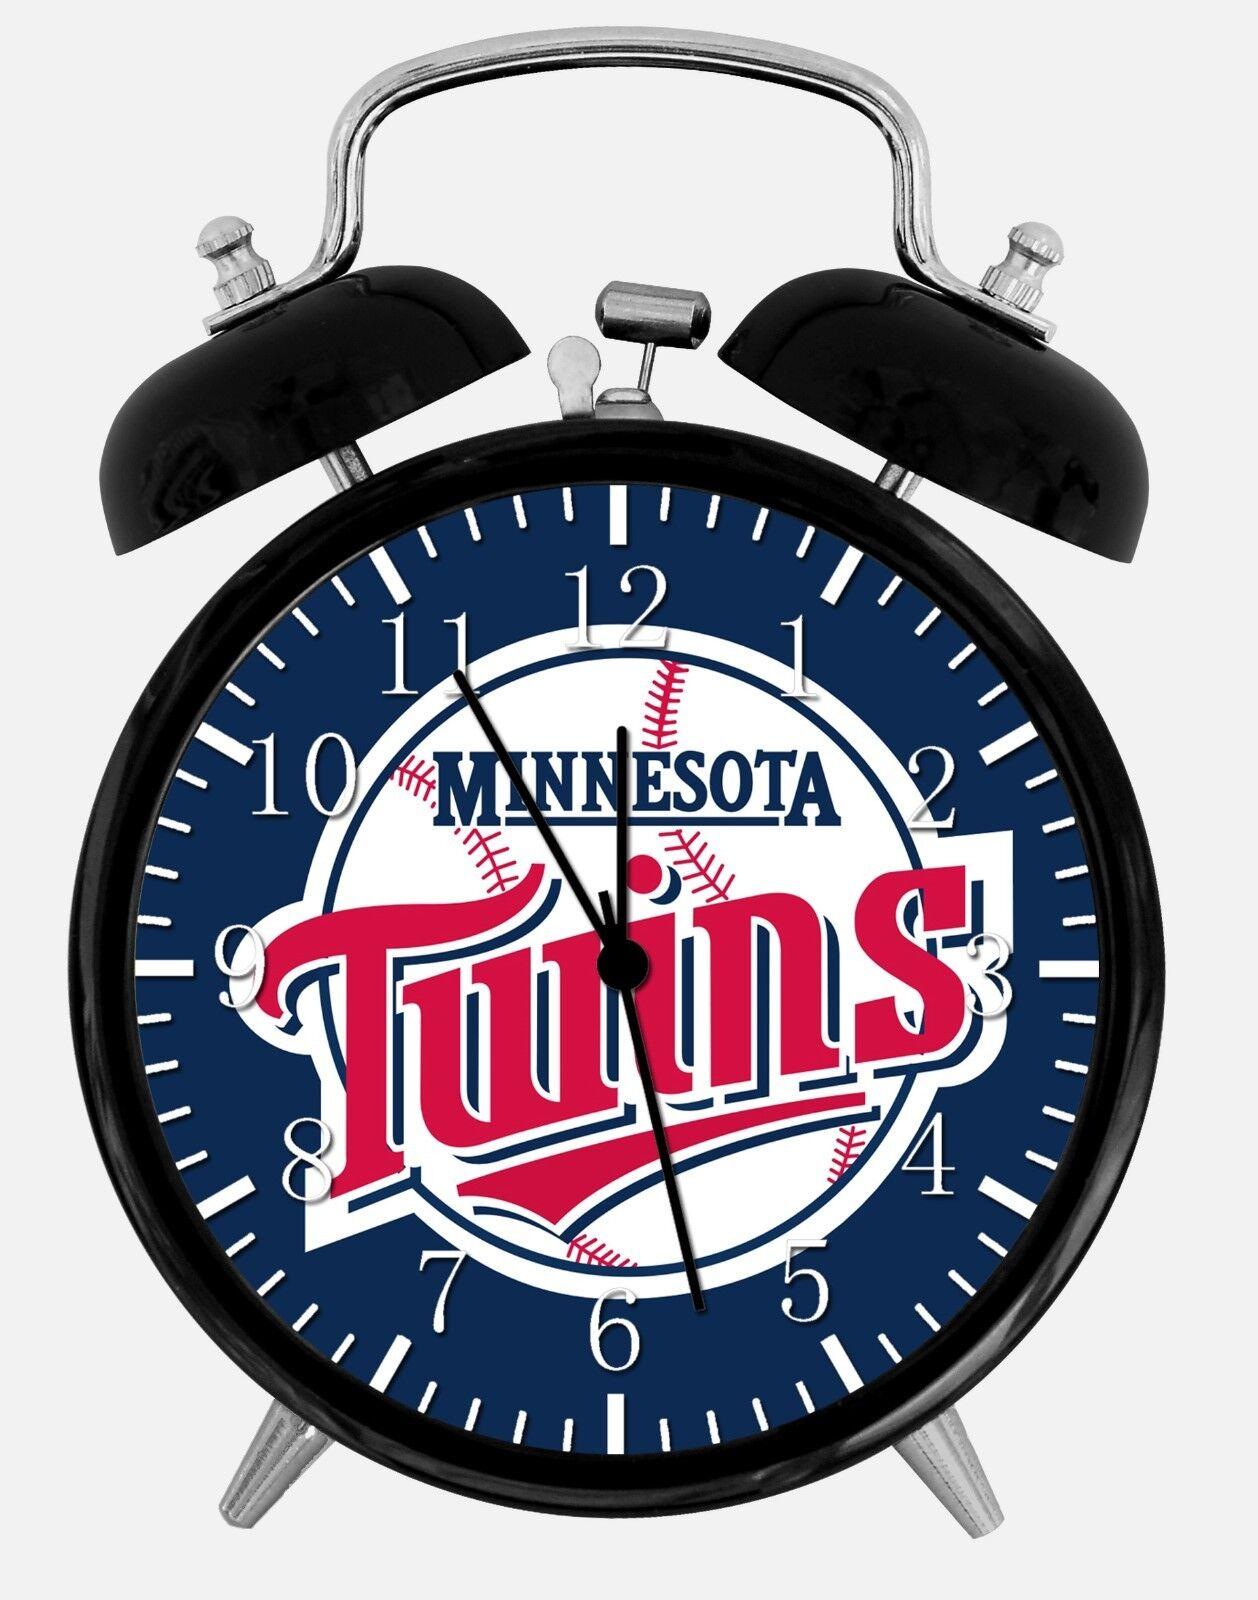 "Minnesota Twins Alarm Desk Clock 3.75"" Home or Office Decor E286 Nice For Gift"